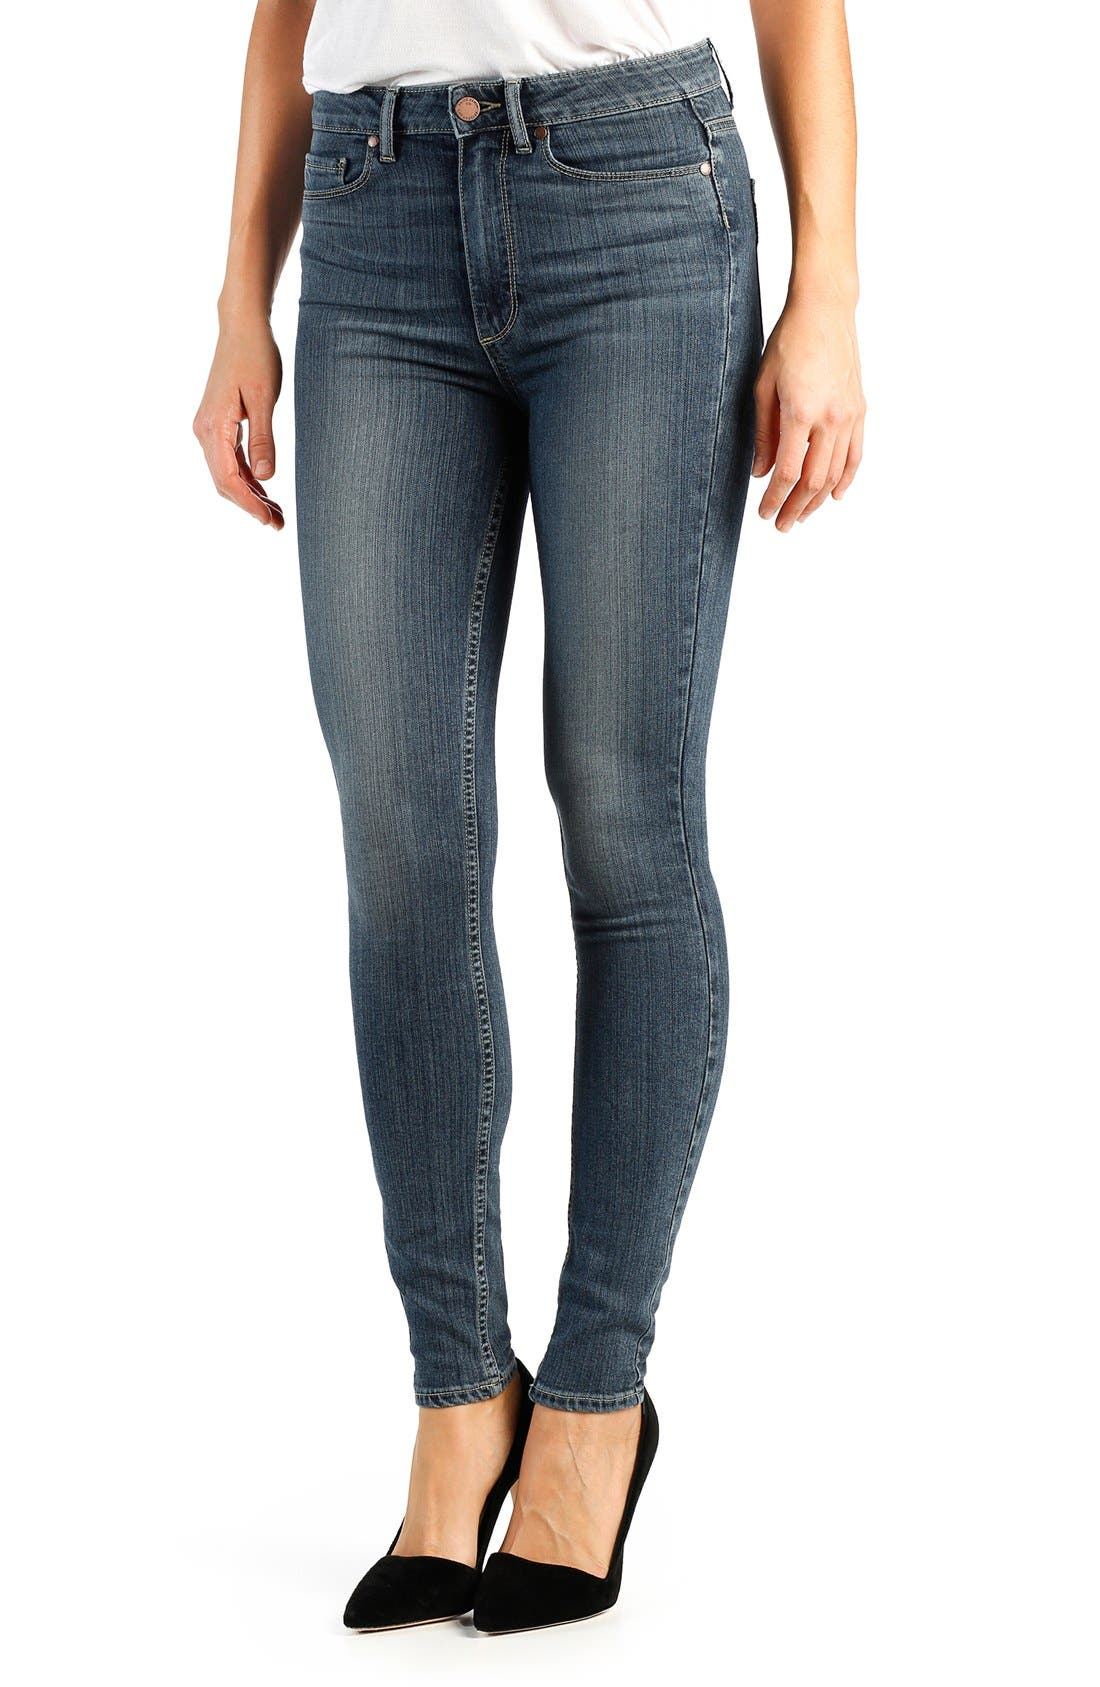 Main Image - Paige Denim 'Transcend - Margot' High Rise Ultra Skinny Jeans (Atlas)